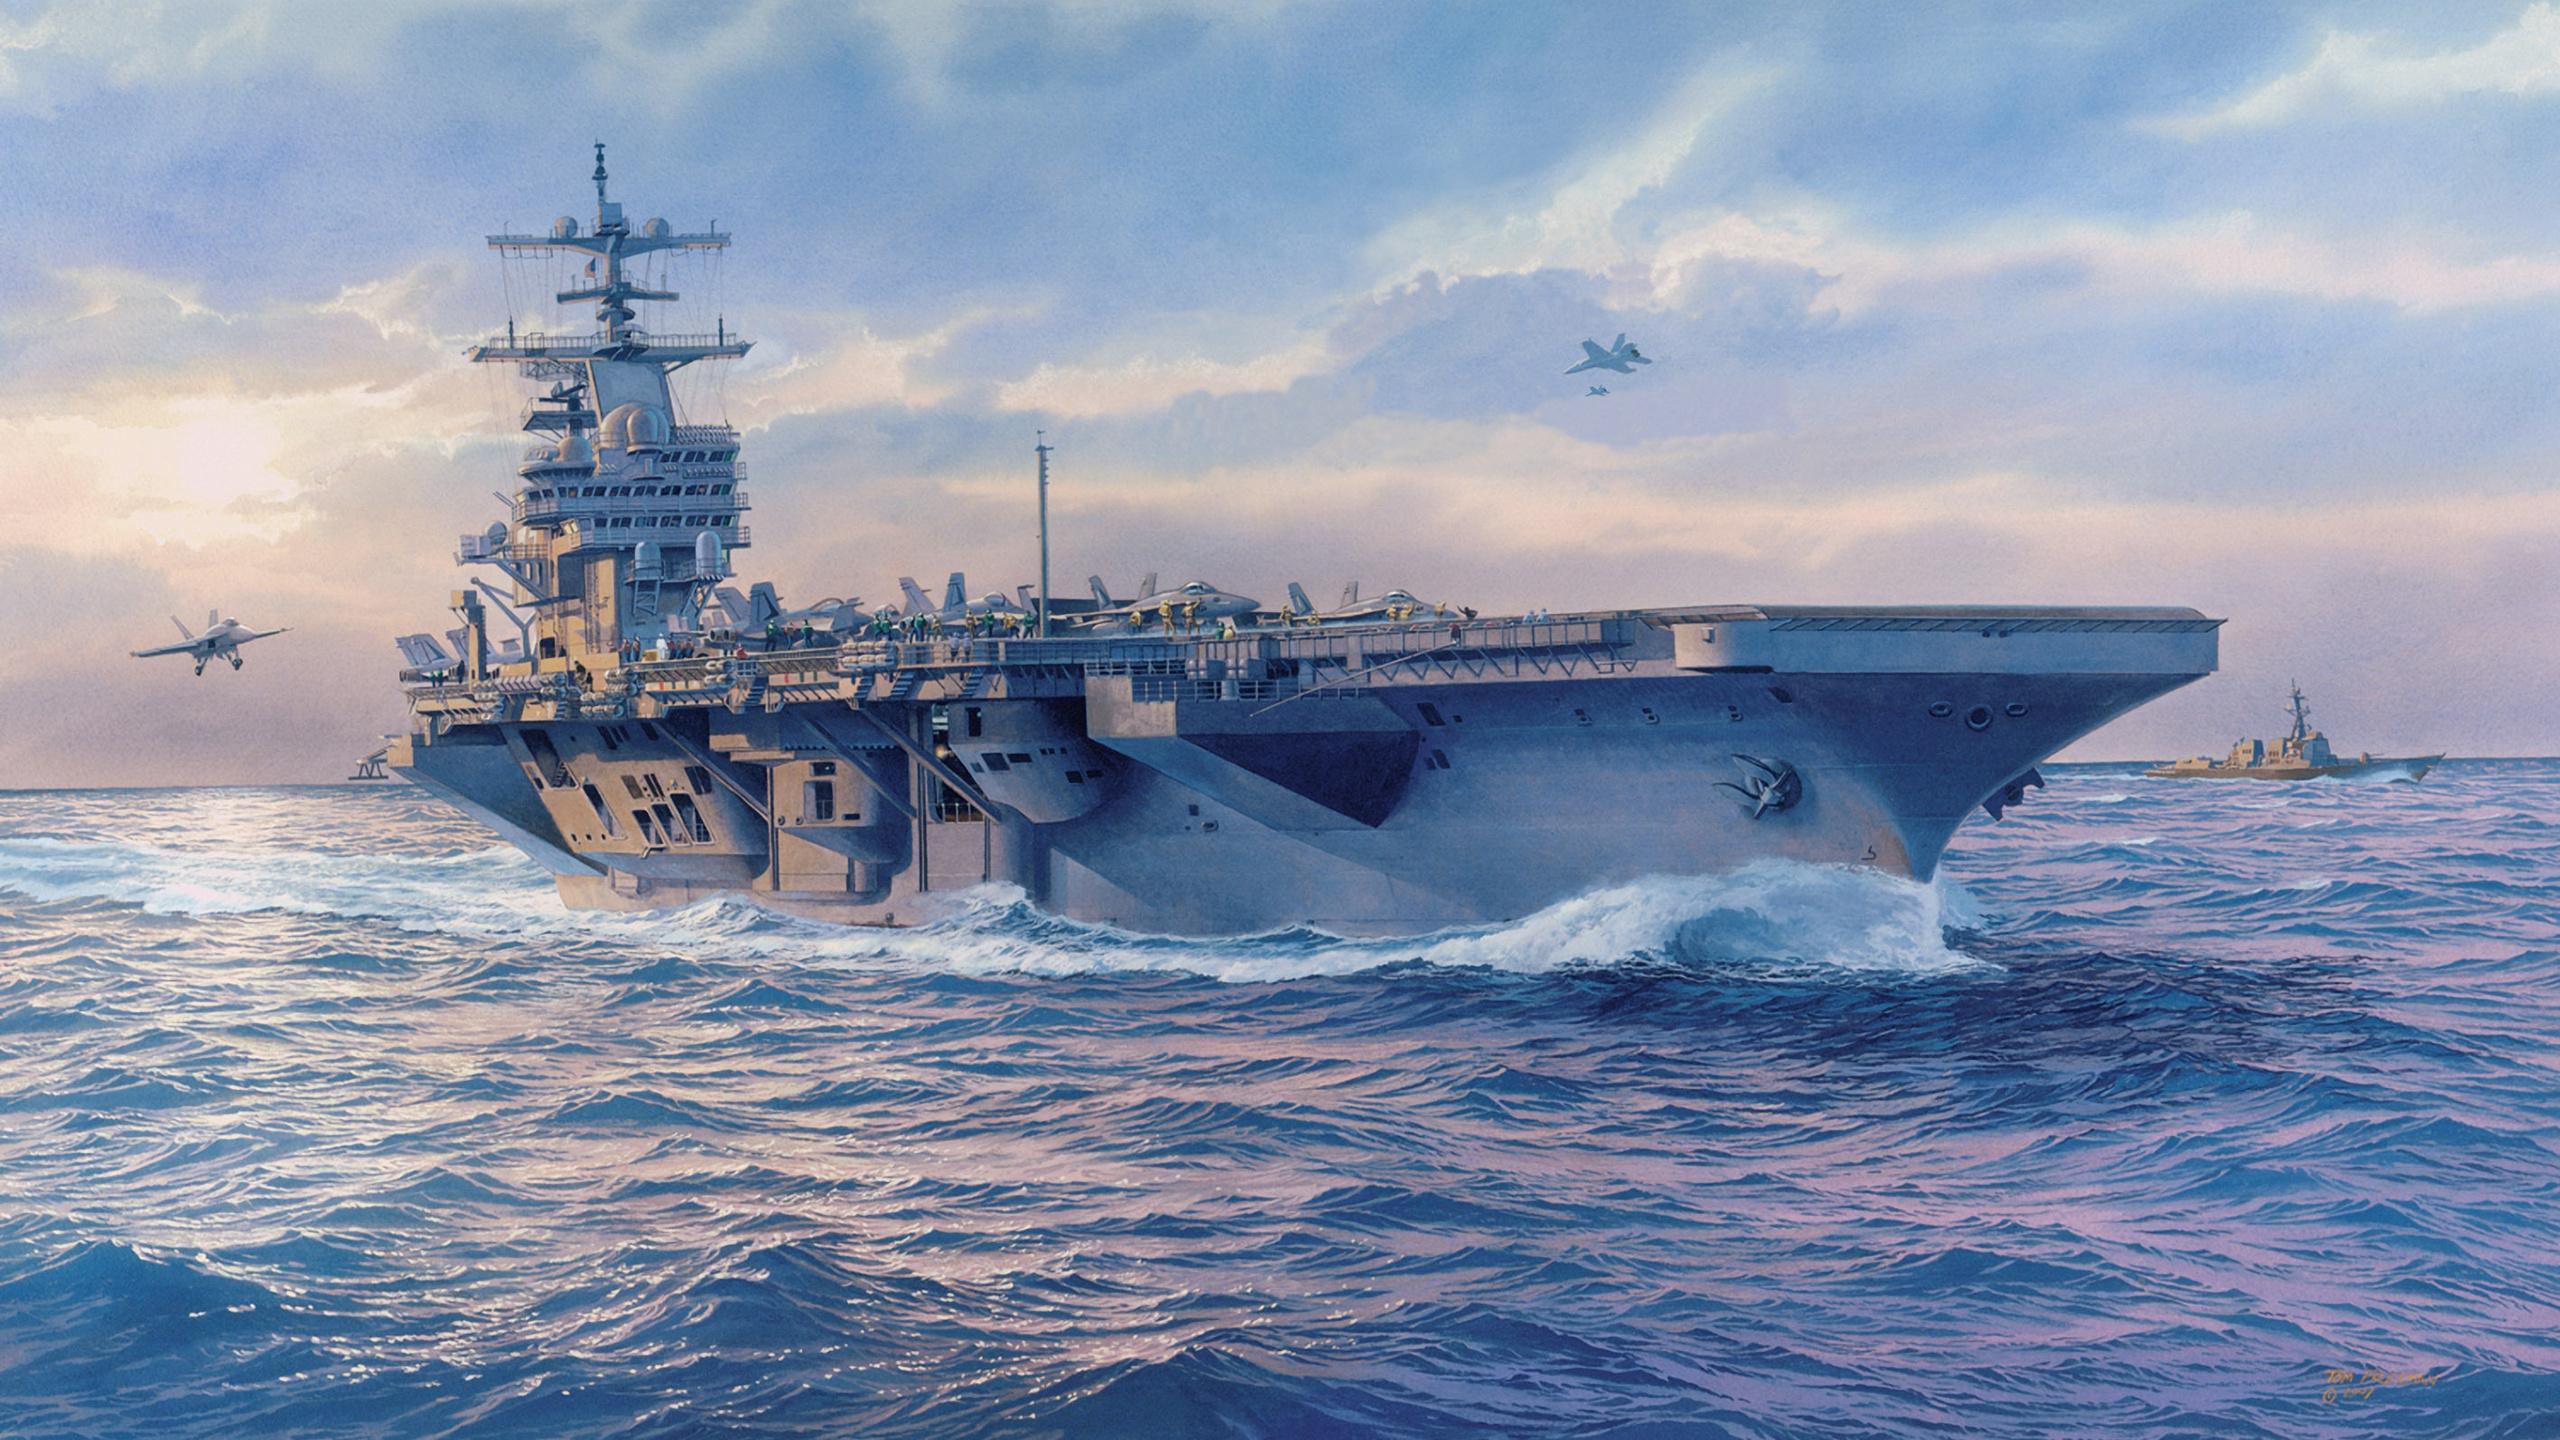 корабль, авианосец, океан